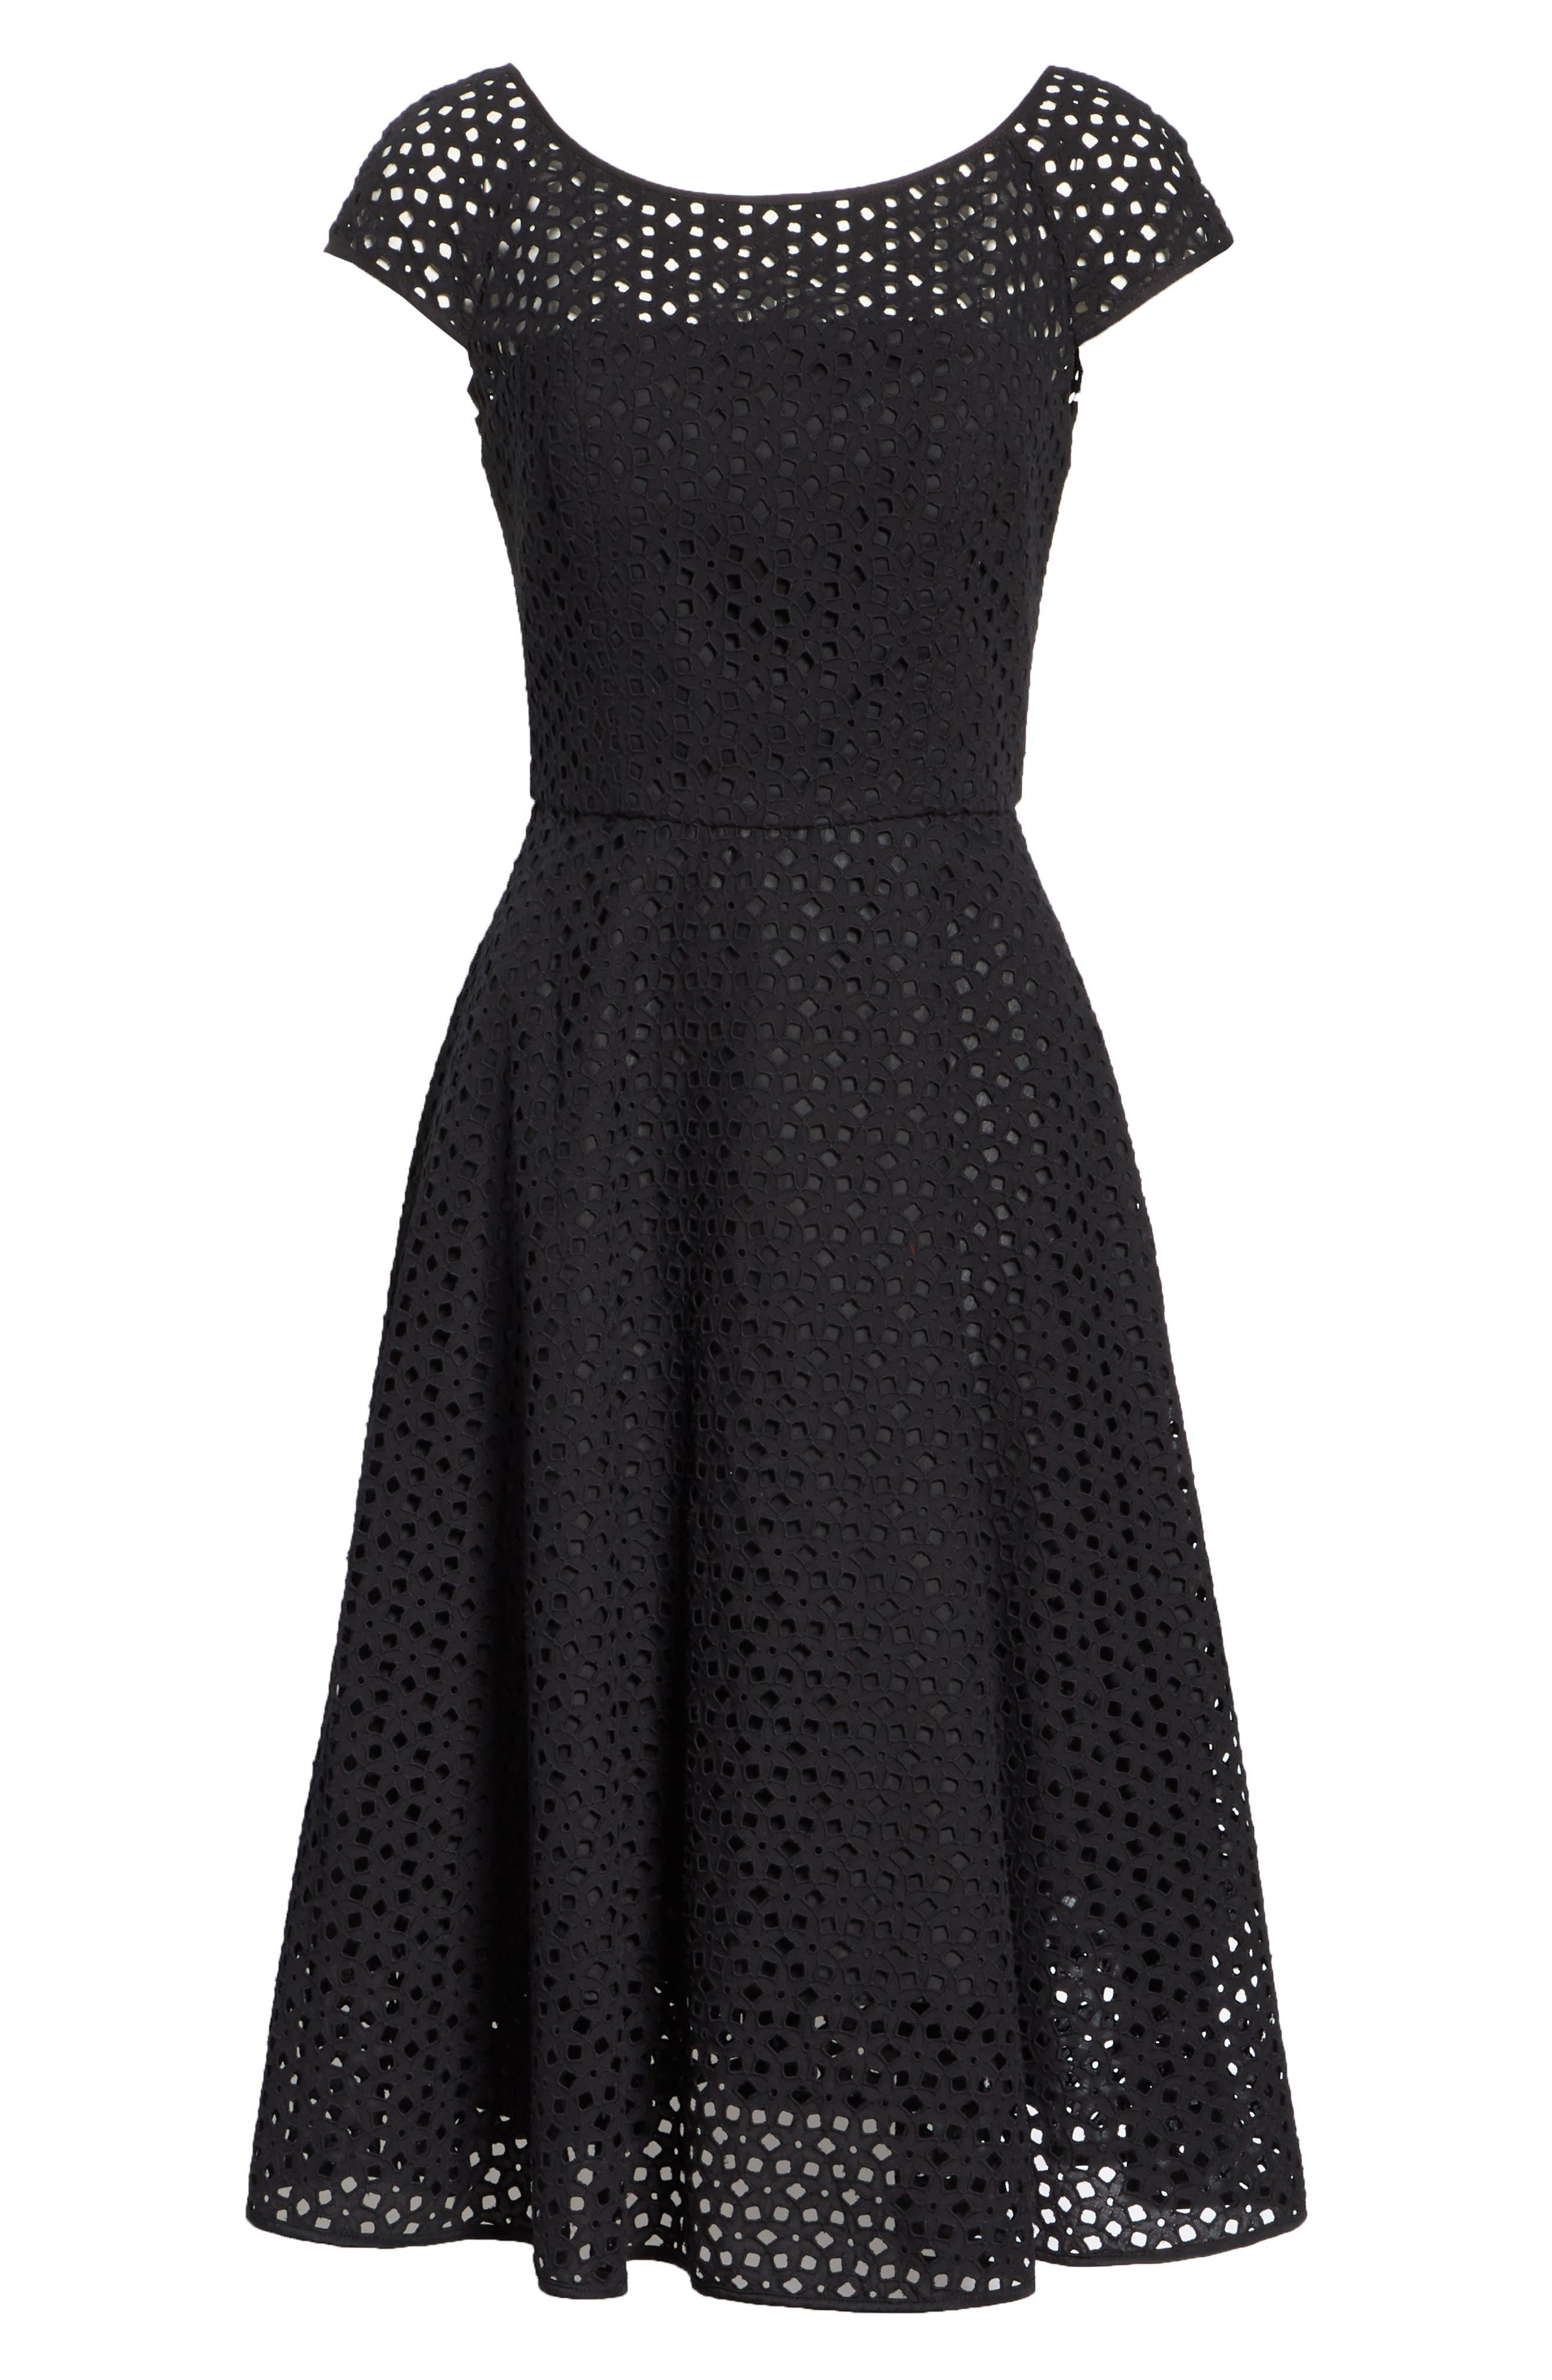 Cathy Cotton Eyelet Dress,                             Alternate thumbnail 6, color,                             001